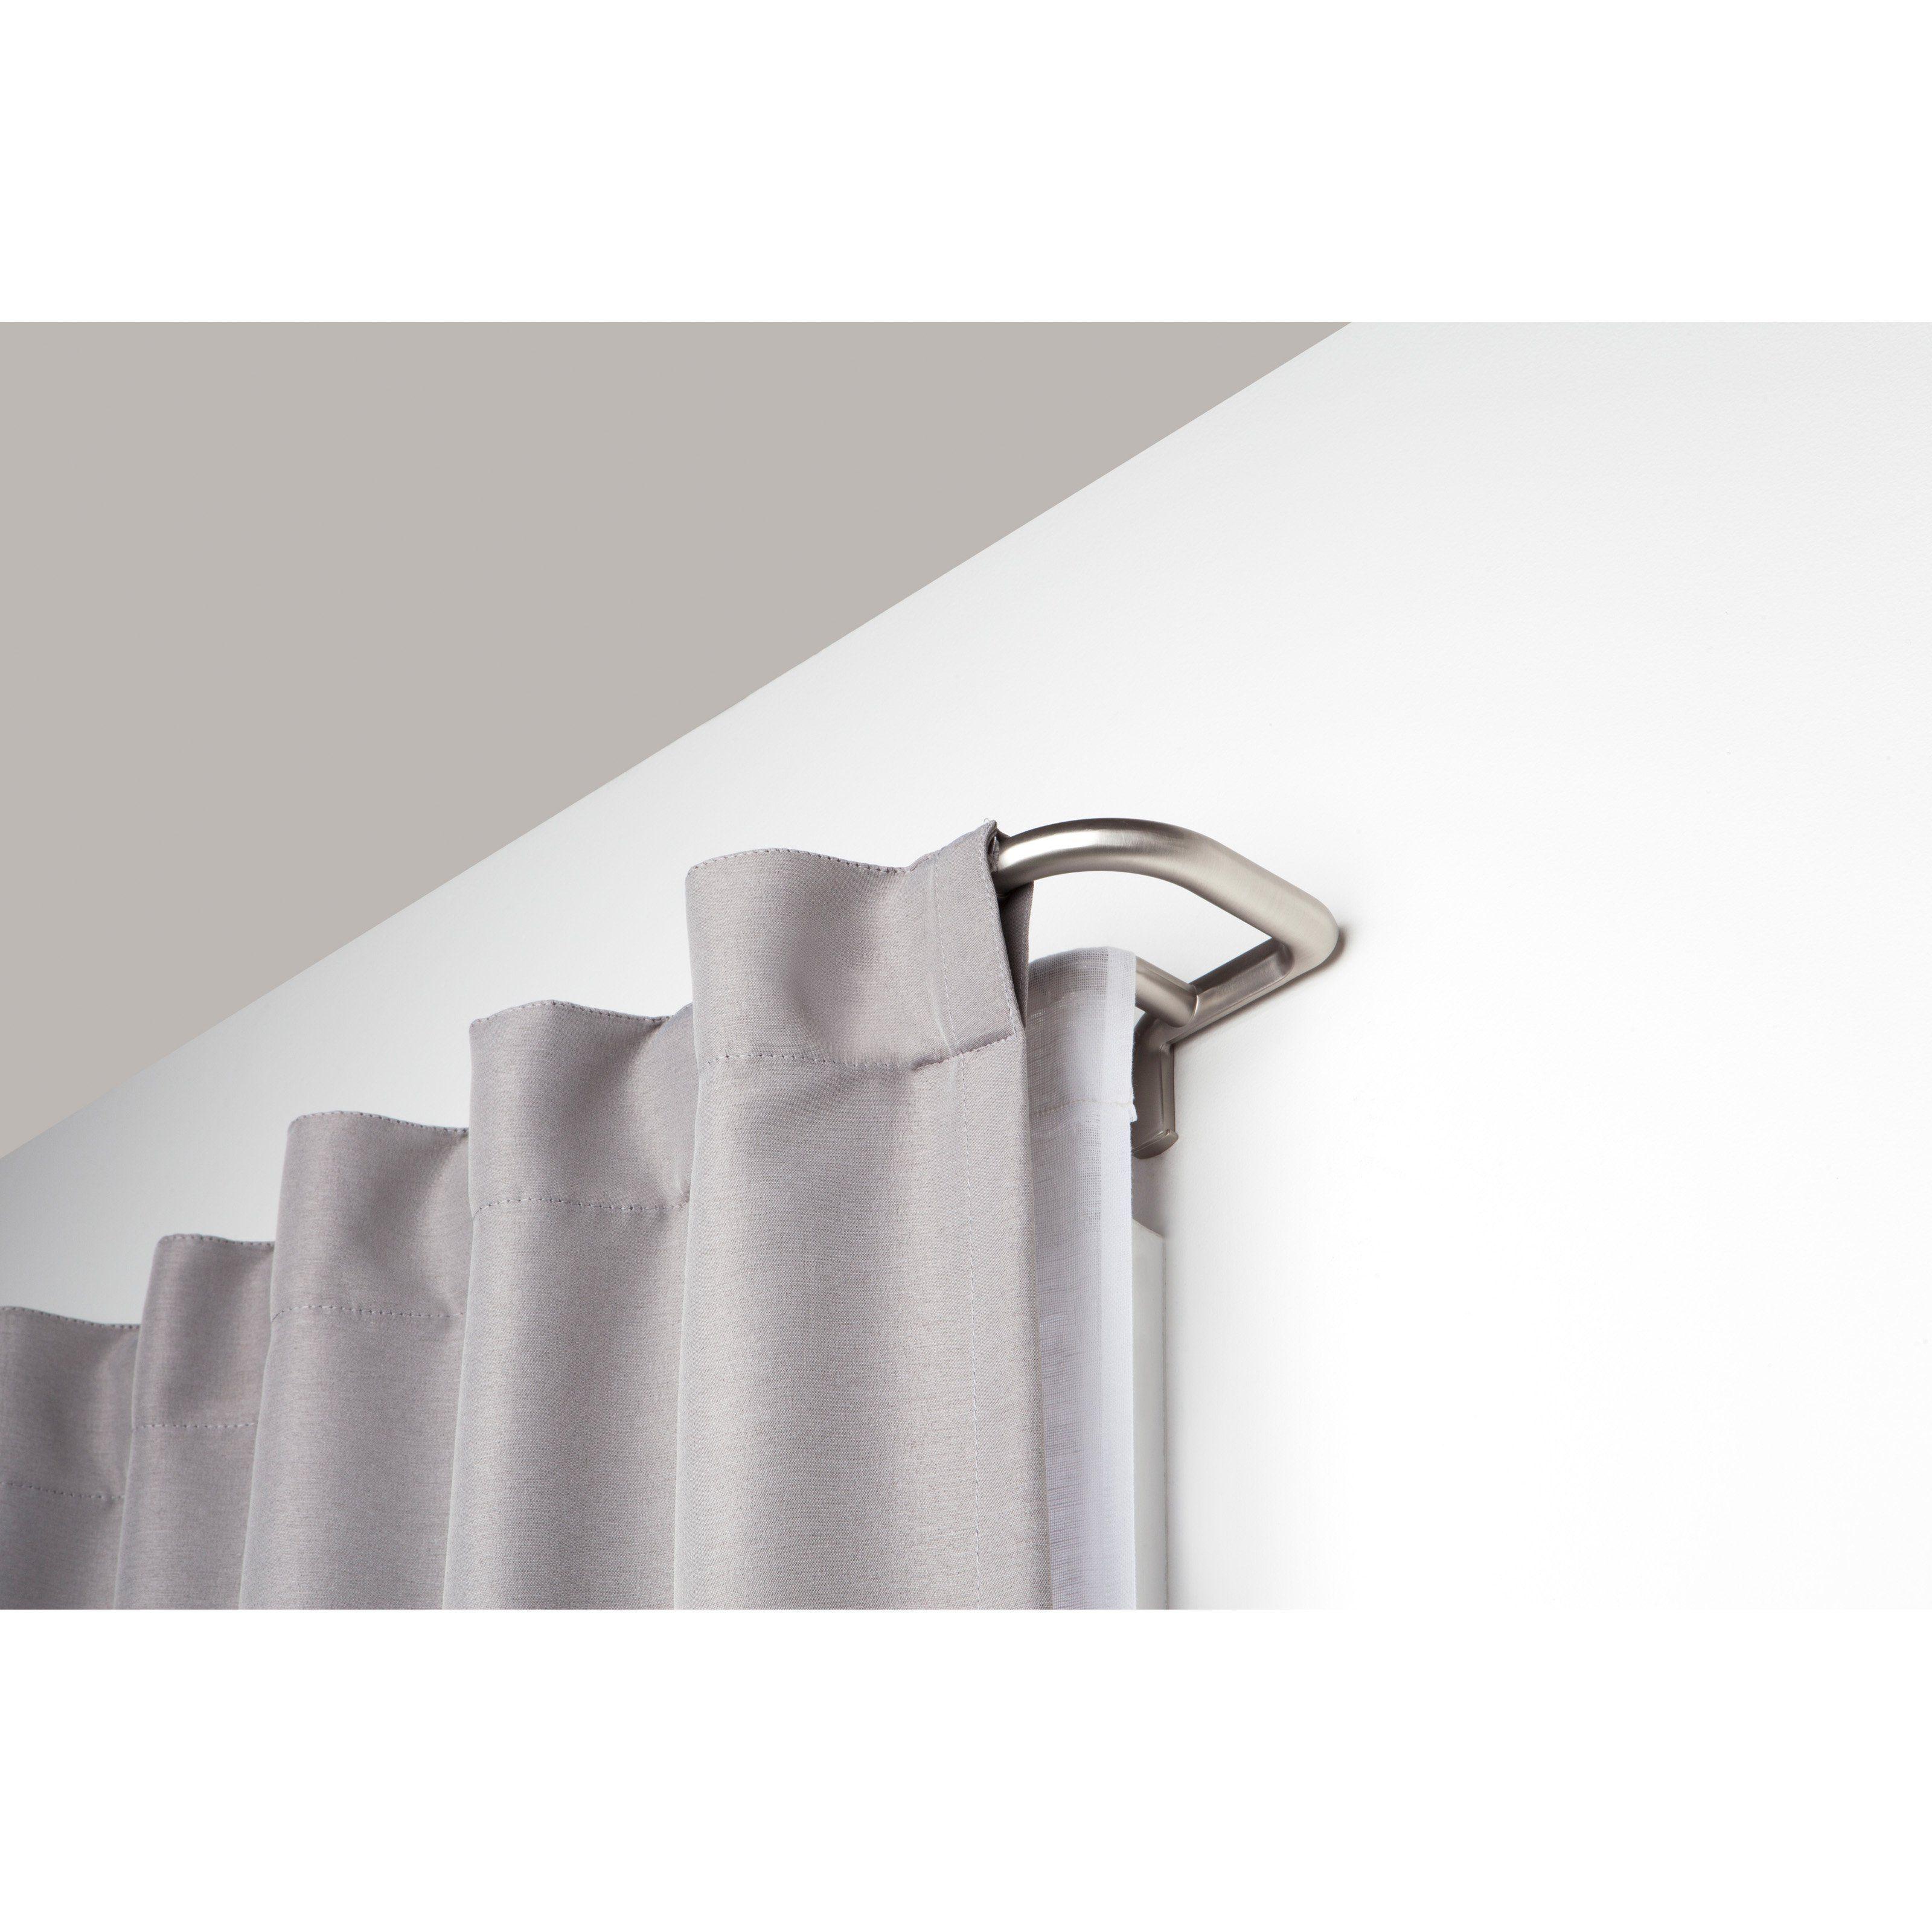 Umbra Llc Twilight Double Curtain Rod Auburn Bronze 1005799 797